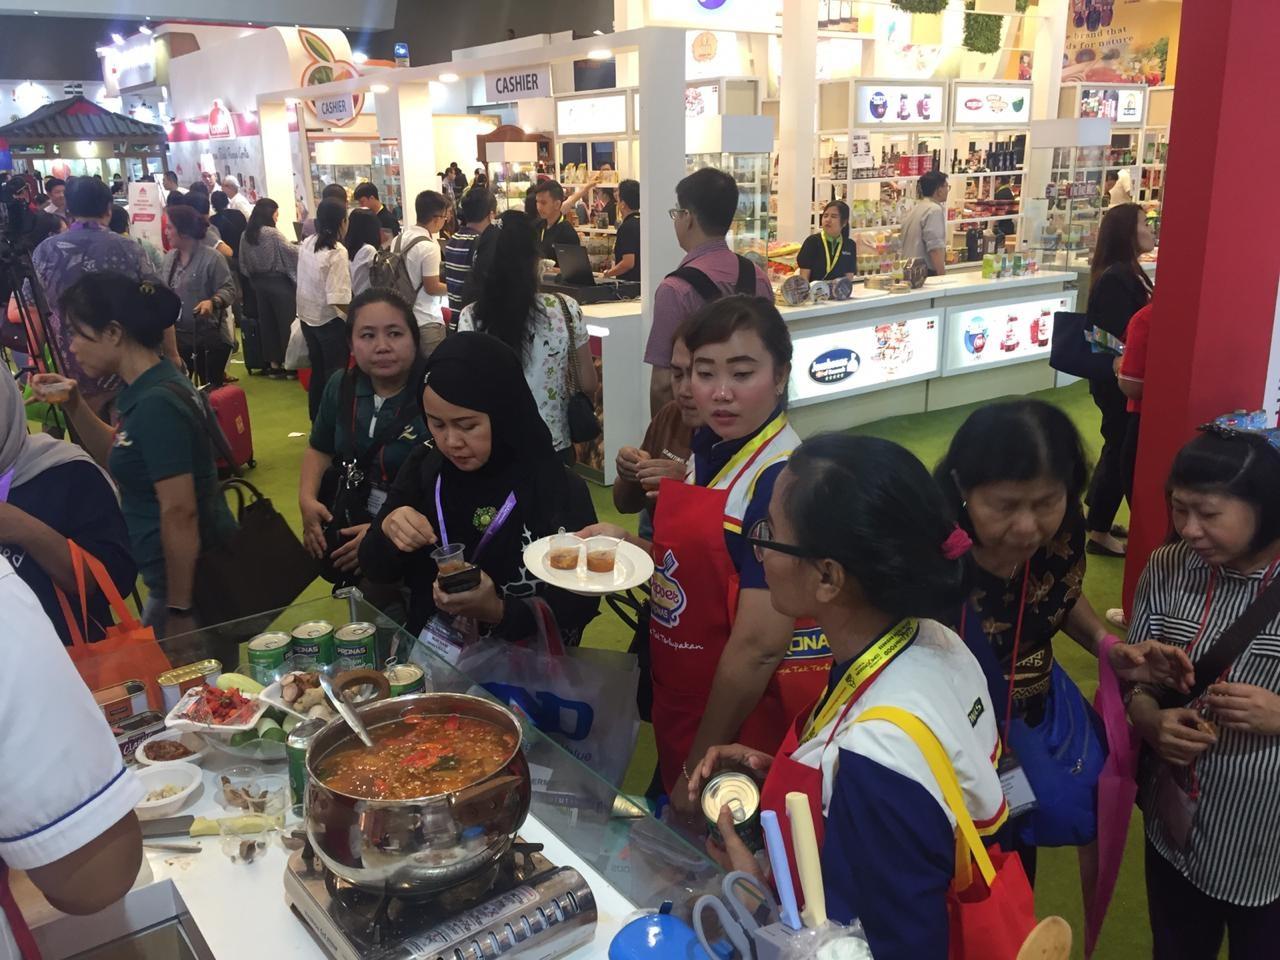 Pronas SIAL Interfood 2019